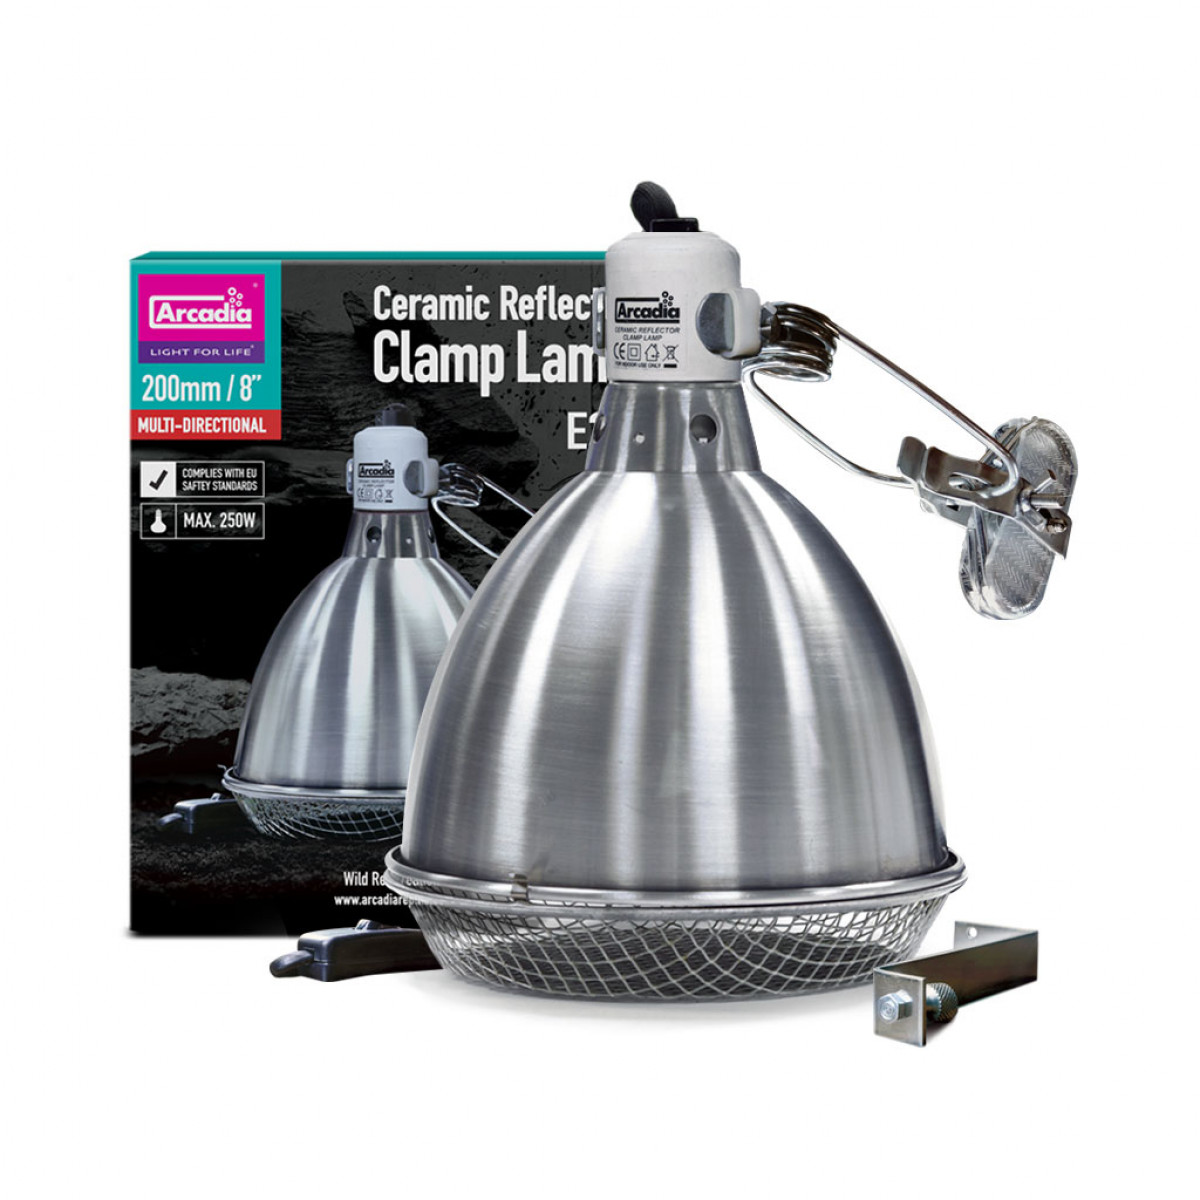 Arcadia Ceramic Reflector Clamp Lamp, 200mm